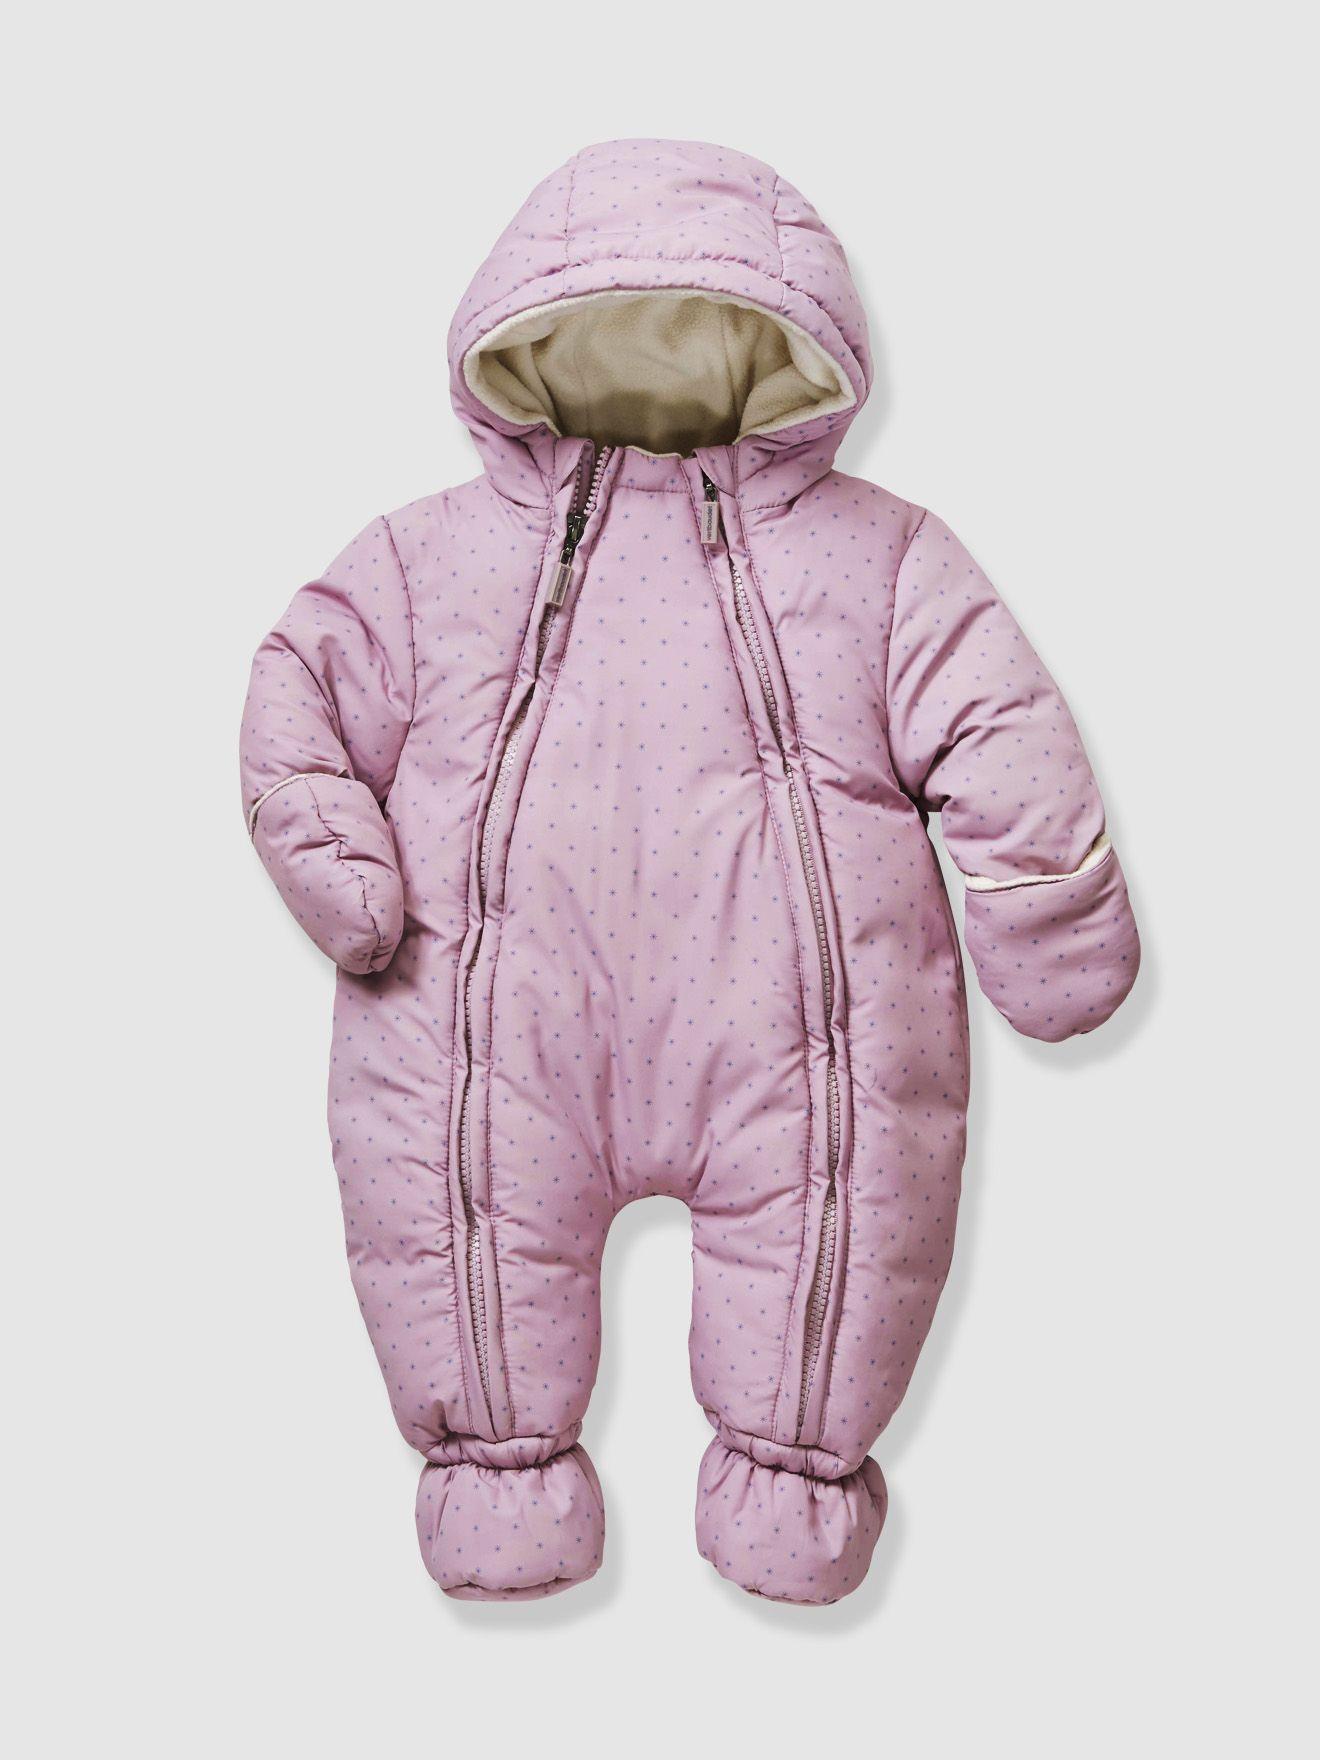 61b1e82d7 Newborn Convertible Pink Purple Snowsuit, Full Length Zip  http://www.parentideal